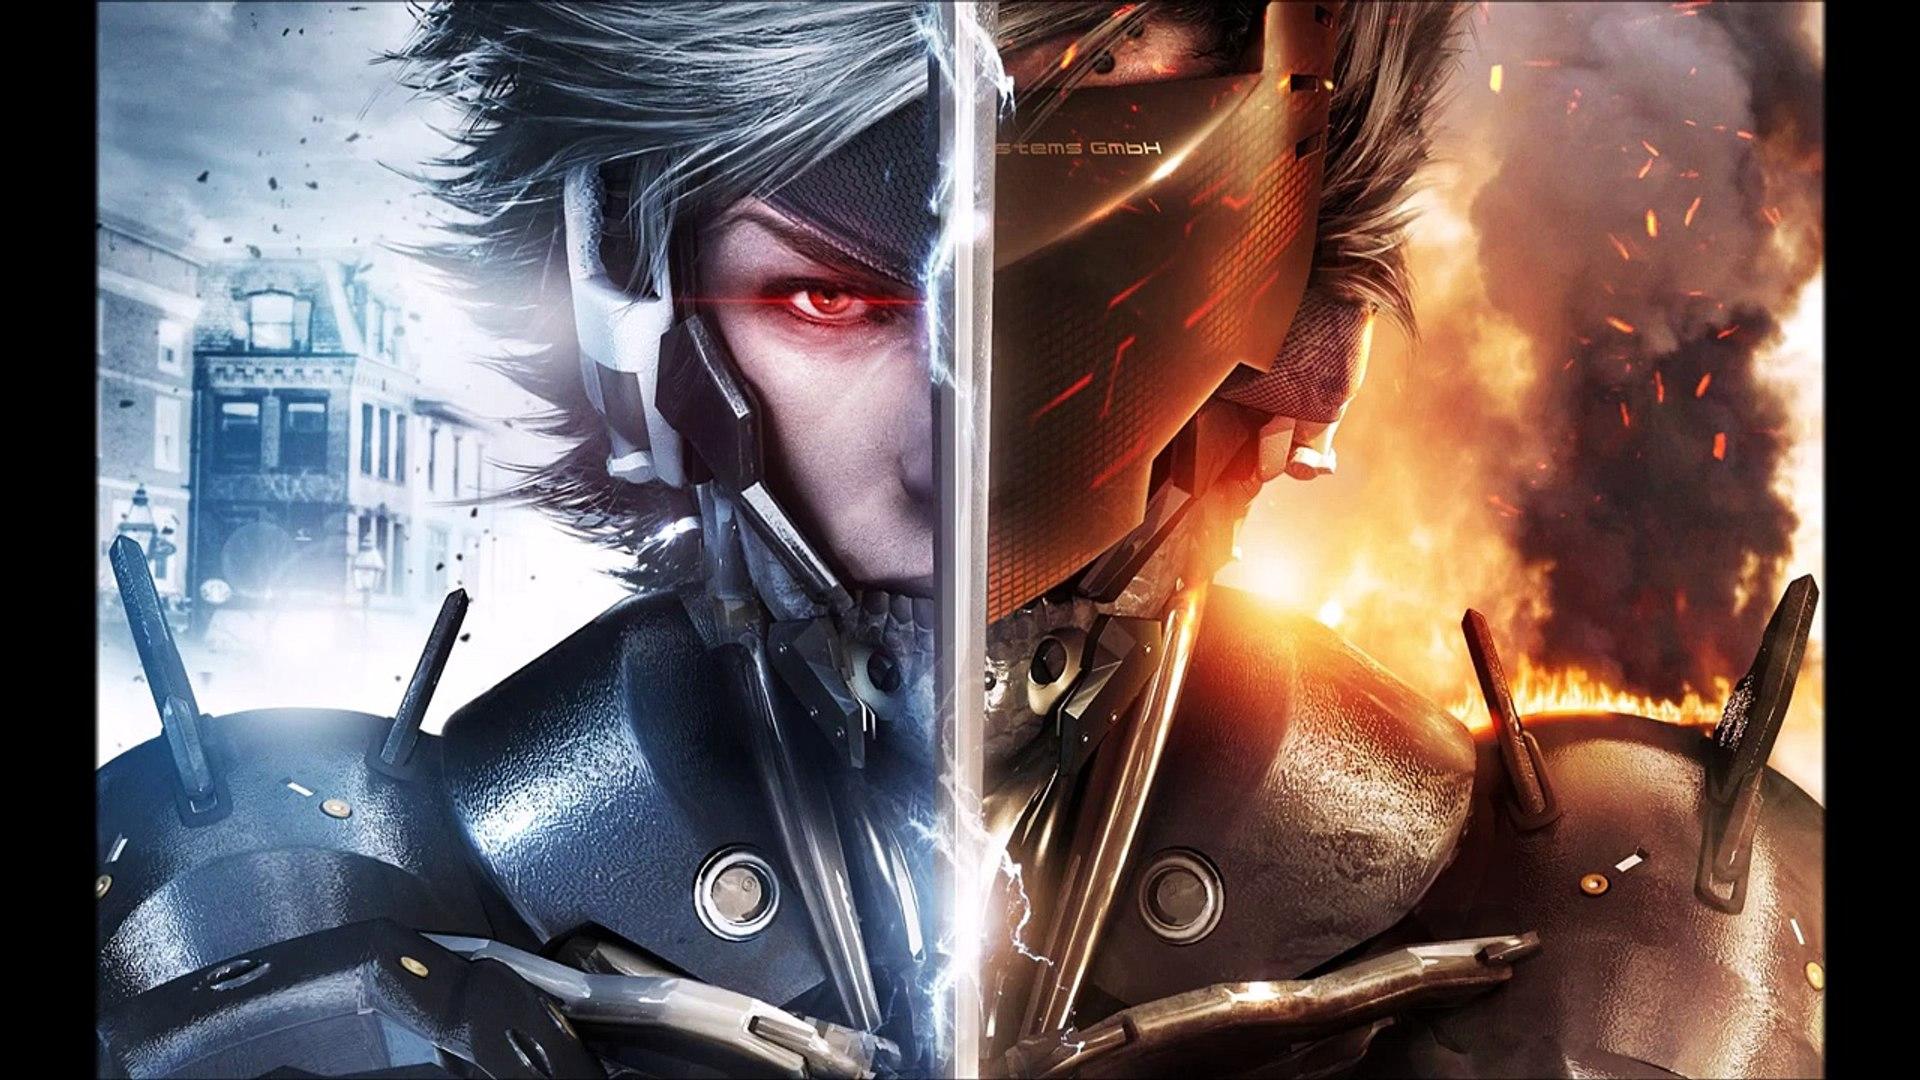 Metal Gear Rising: Revengeance OST 06 - Return to Ashes